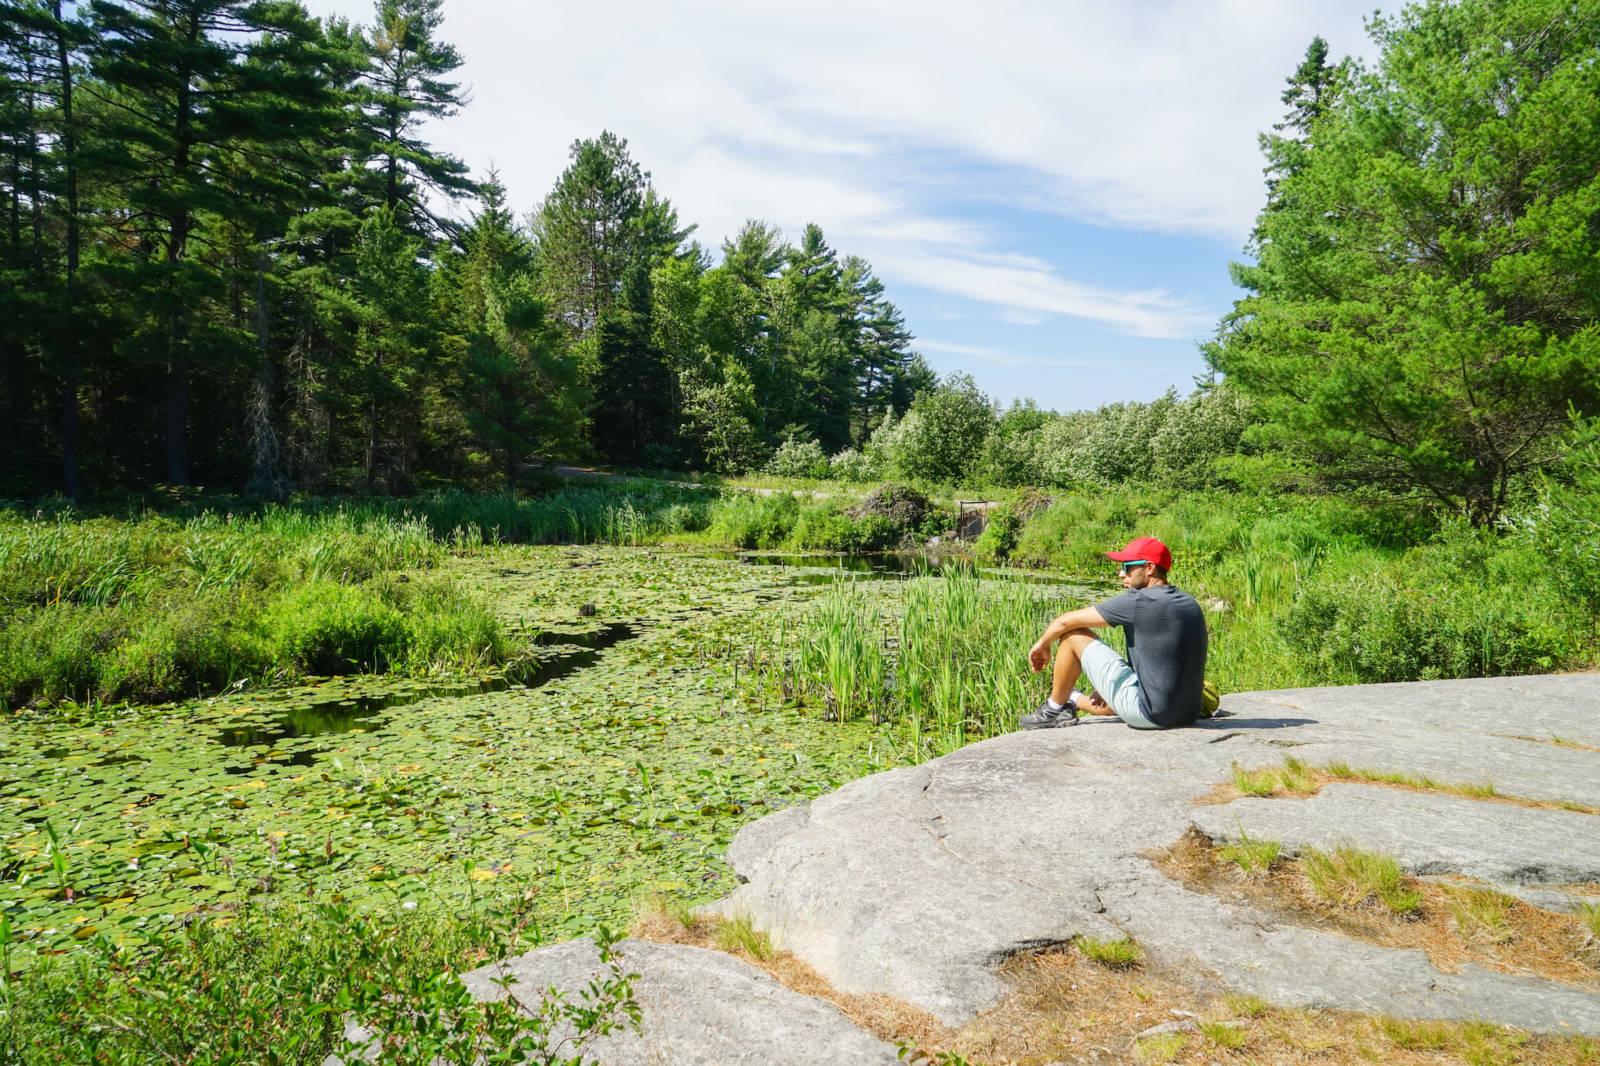 Camping in Ontario Canada_1